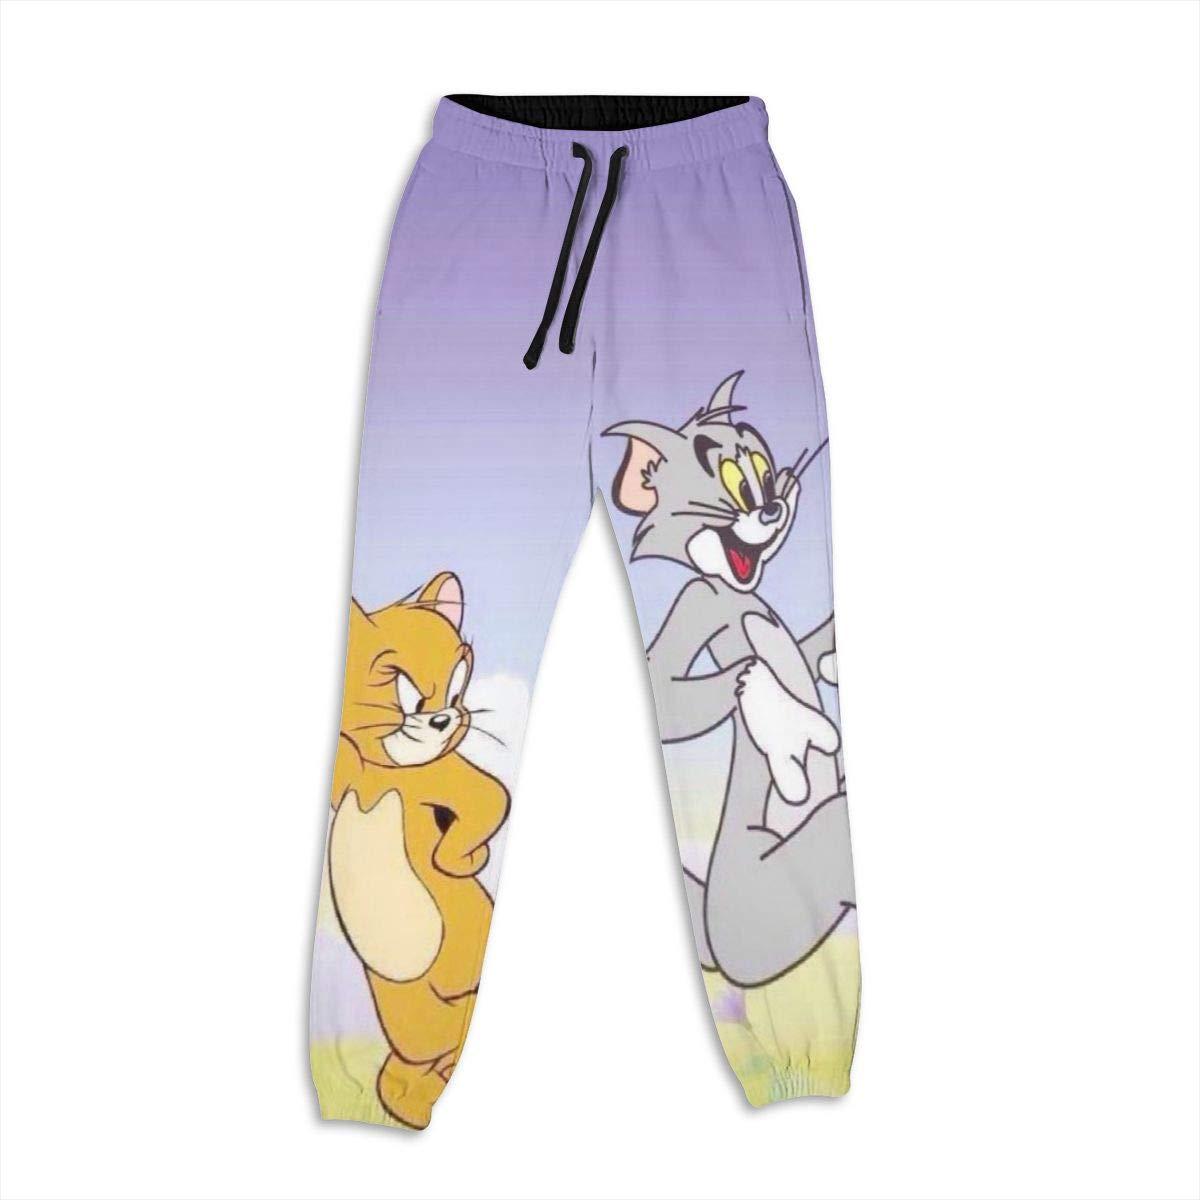 Xzcxyadd Womens Jogger Lounge Sleep Sweatpants Pajamas Pants Tom and Jerry Funny Print Drawstring Lounge Pants (S-XXL)